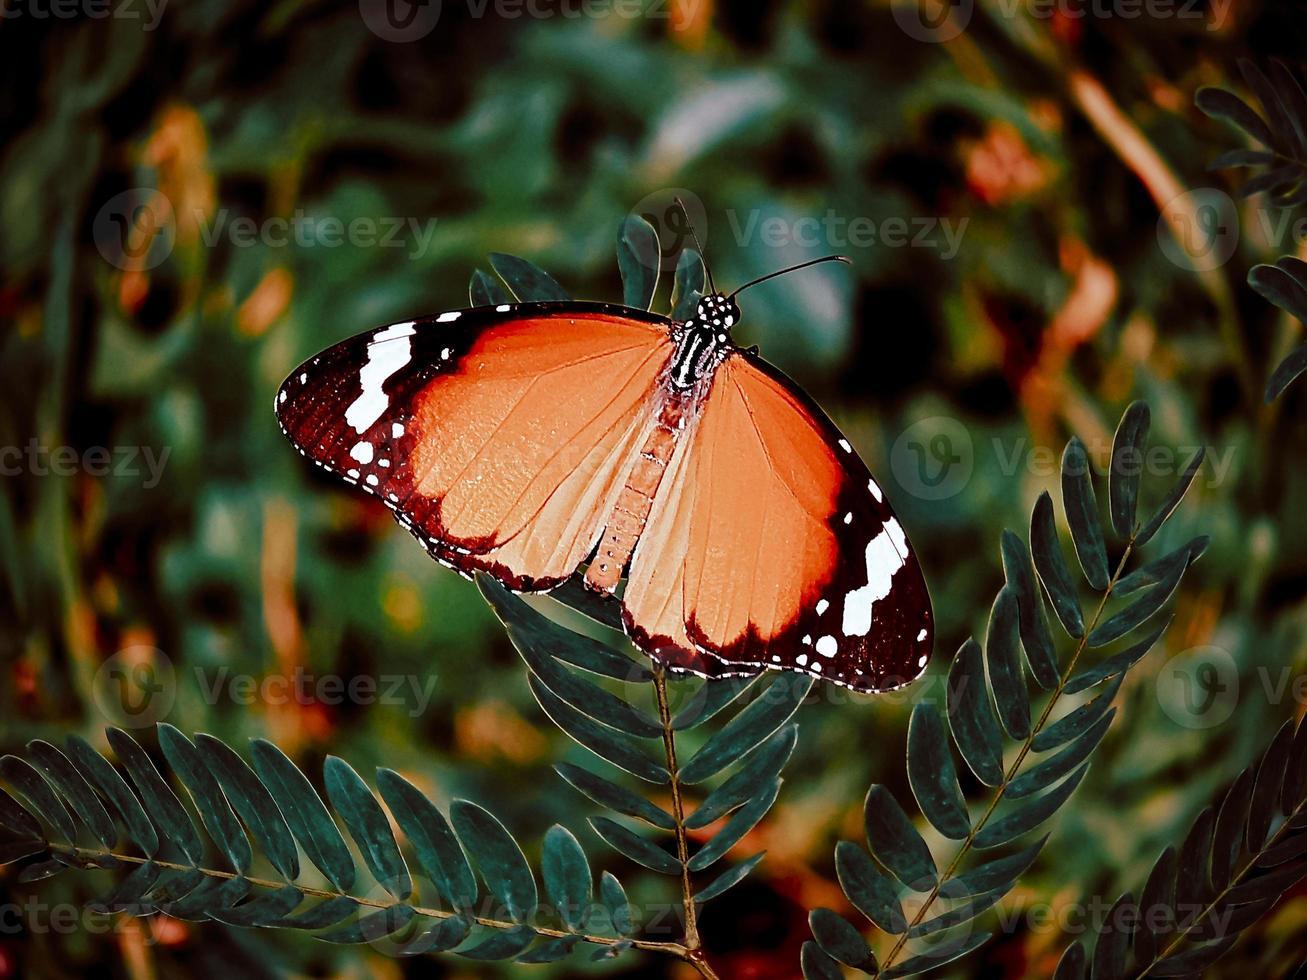 Danaid Eggfly weiblich, Hypolimnas misippus foto